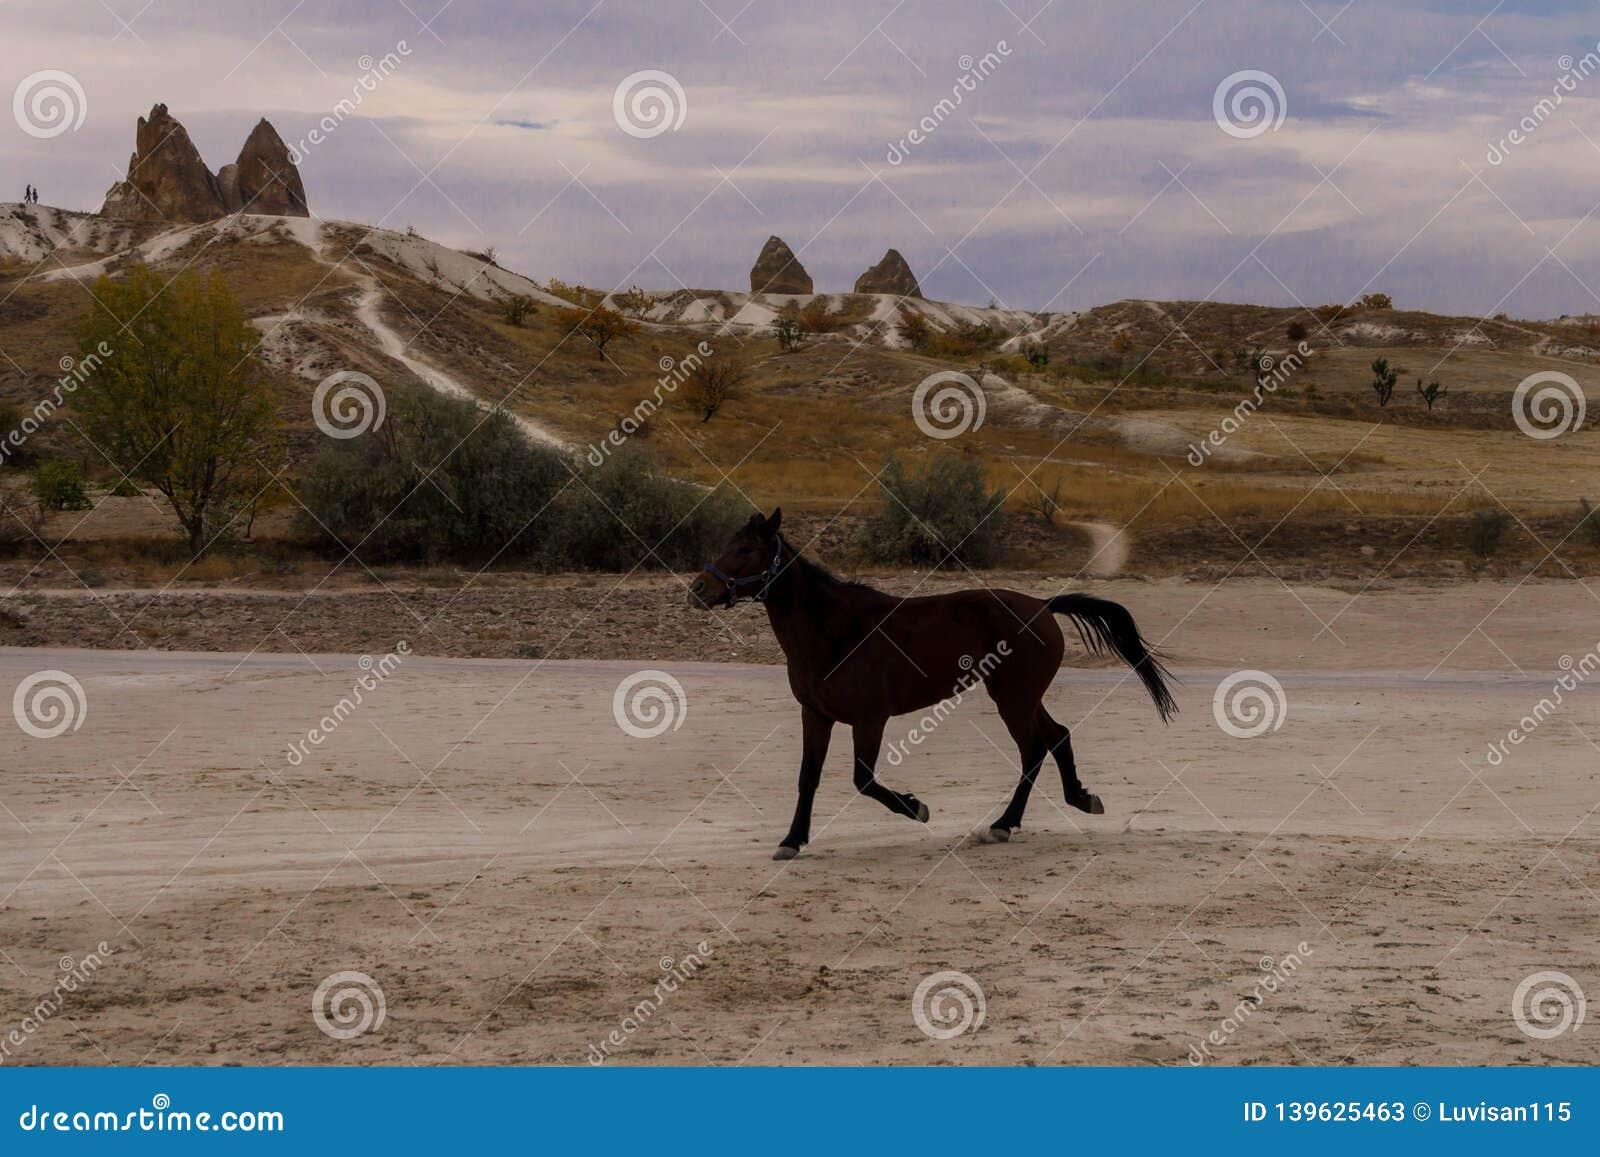 Beautiful free horse runs among stone sculptures